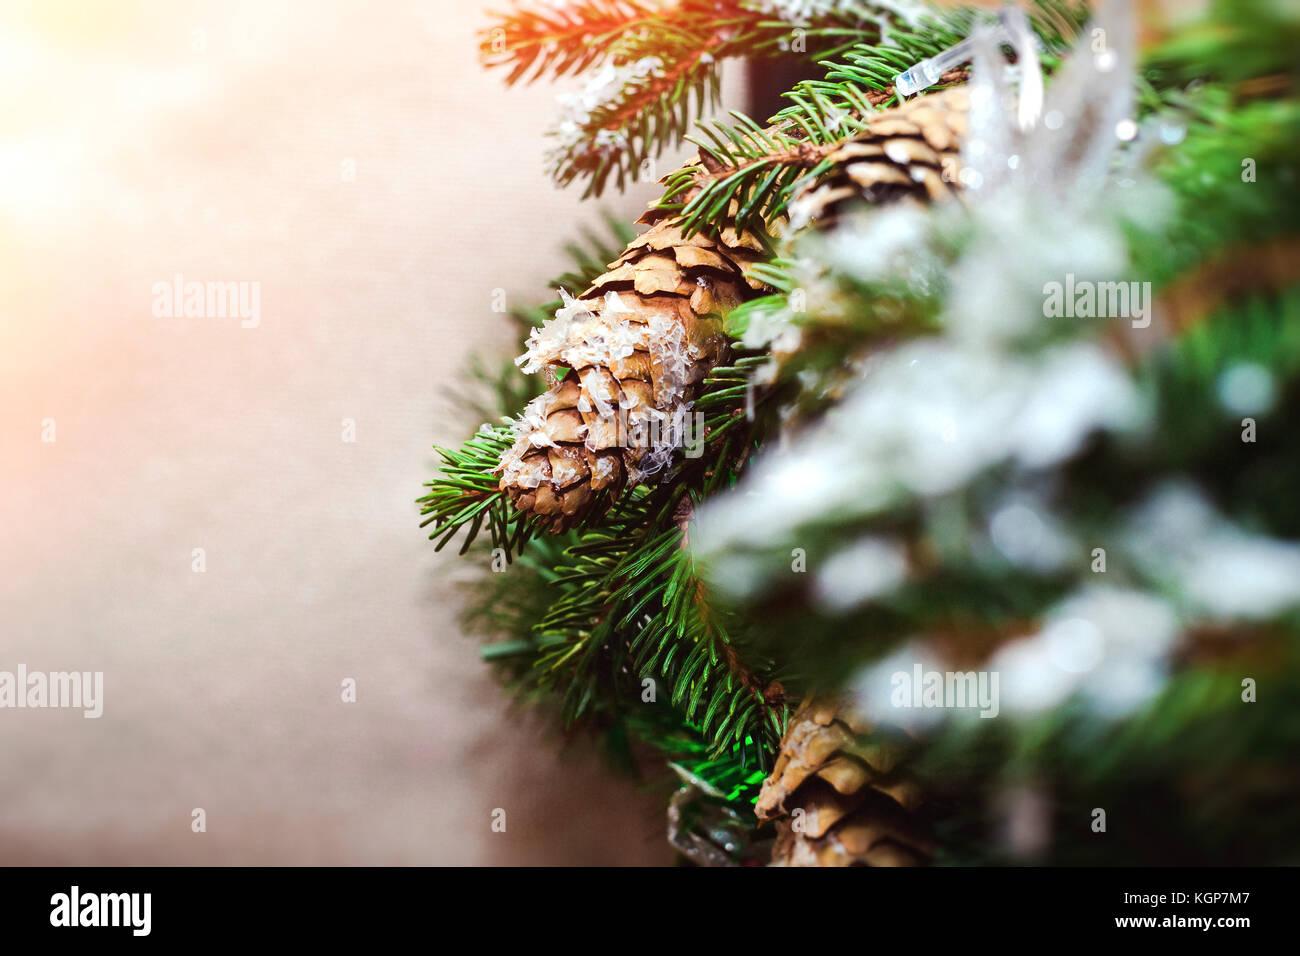 wreath hanging stockfotos wreath hanging bilder seite 5 alamy. Black Bedroom Furniture Sets. Home Design Ideas